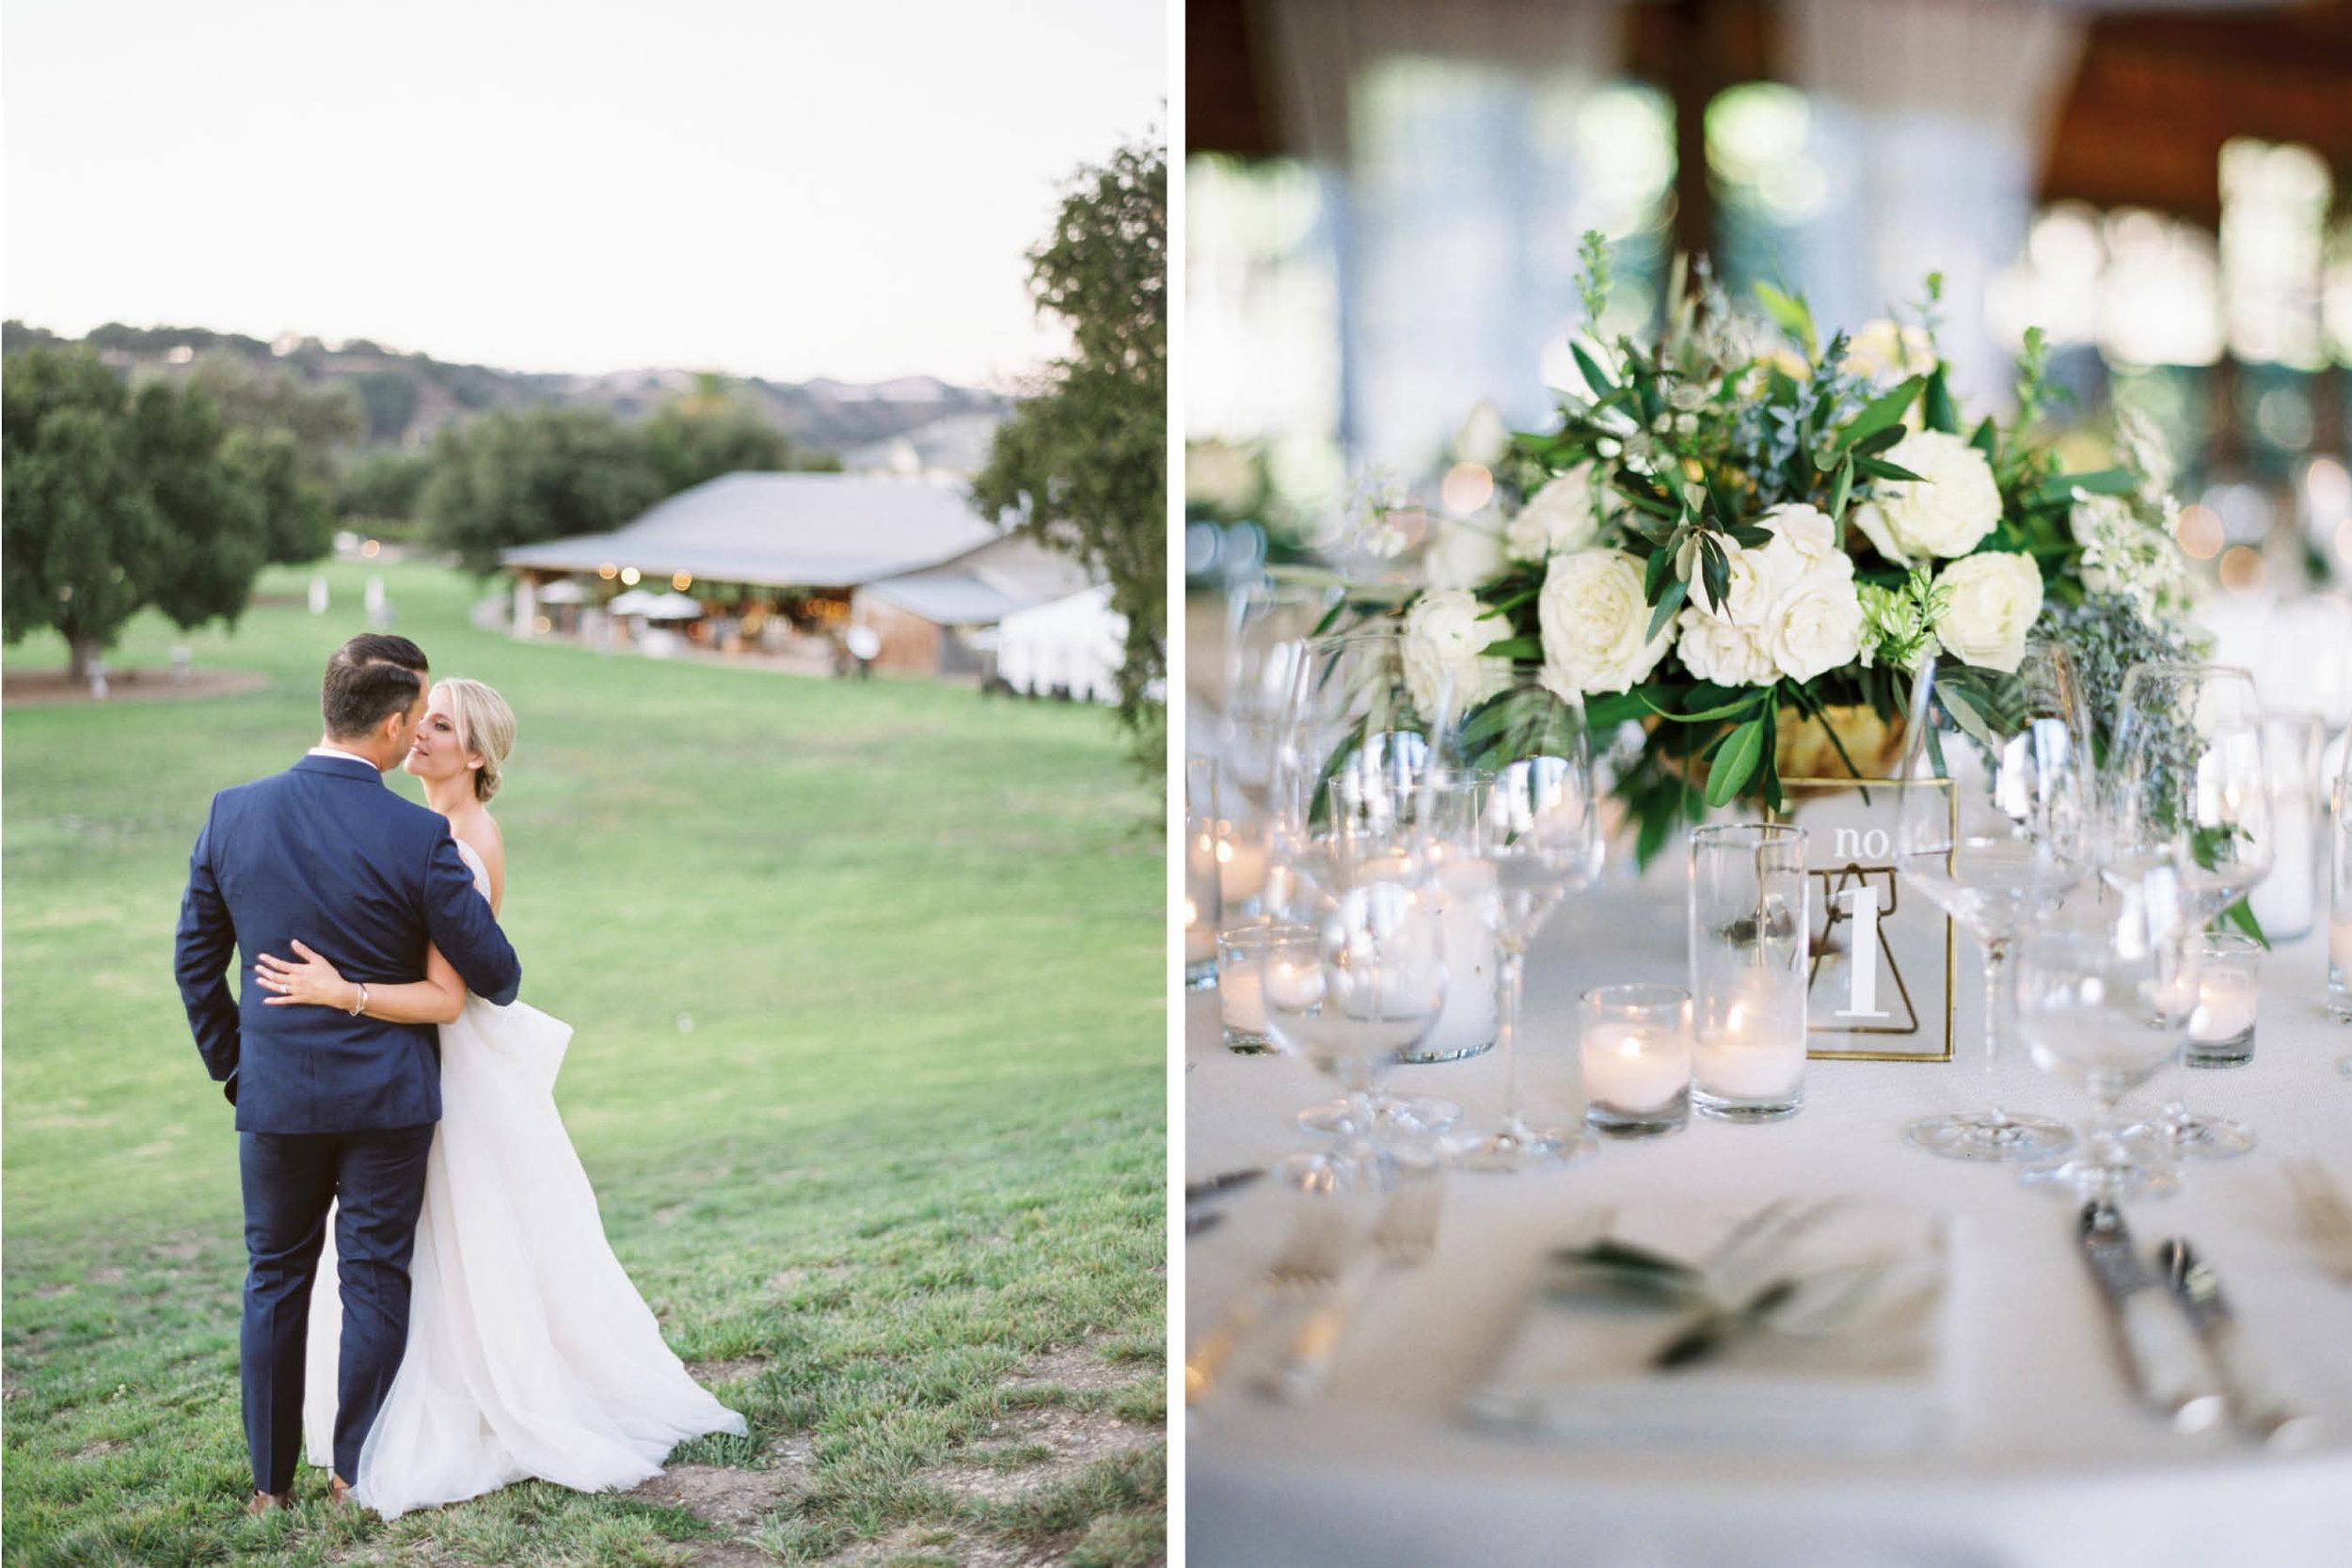 alegria-by-design-wedding-planner-planning-event-design-coordinator-day-of-month-crossroads-estate-garden-vineyard-firestone-barn-location-rustic-santa-barbara (1 (18).jpg